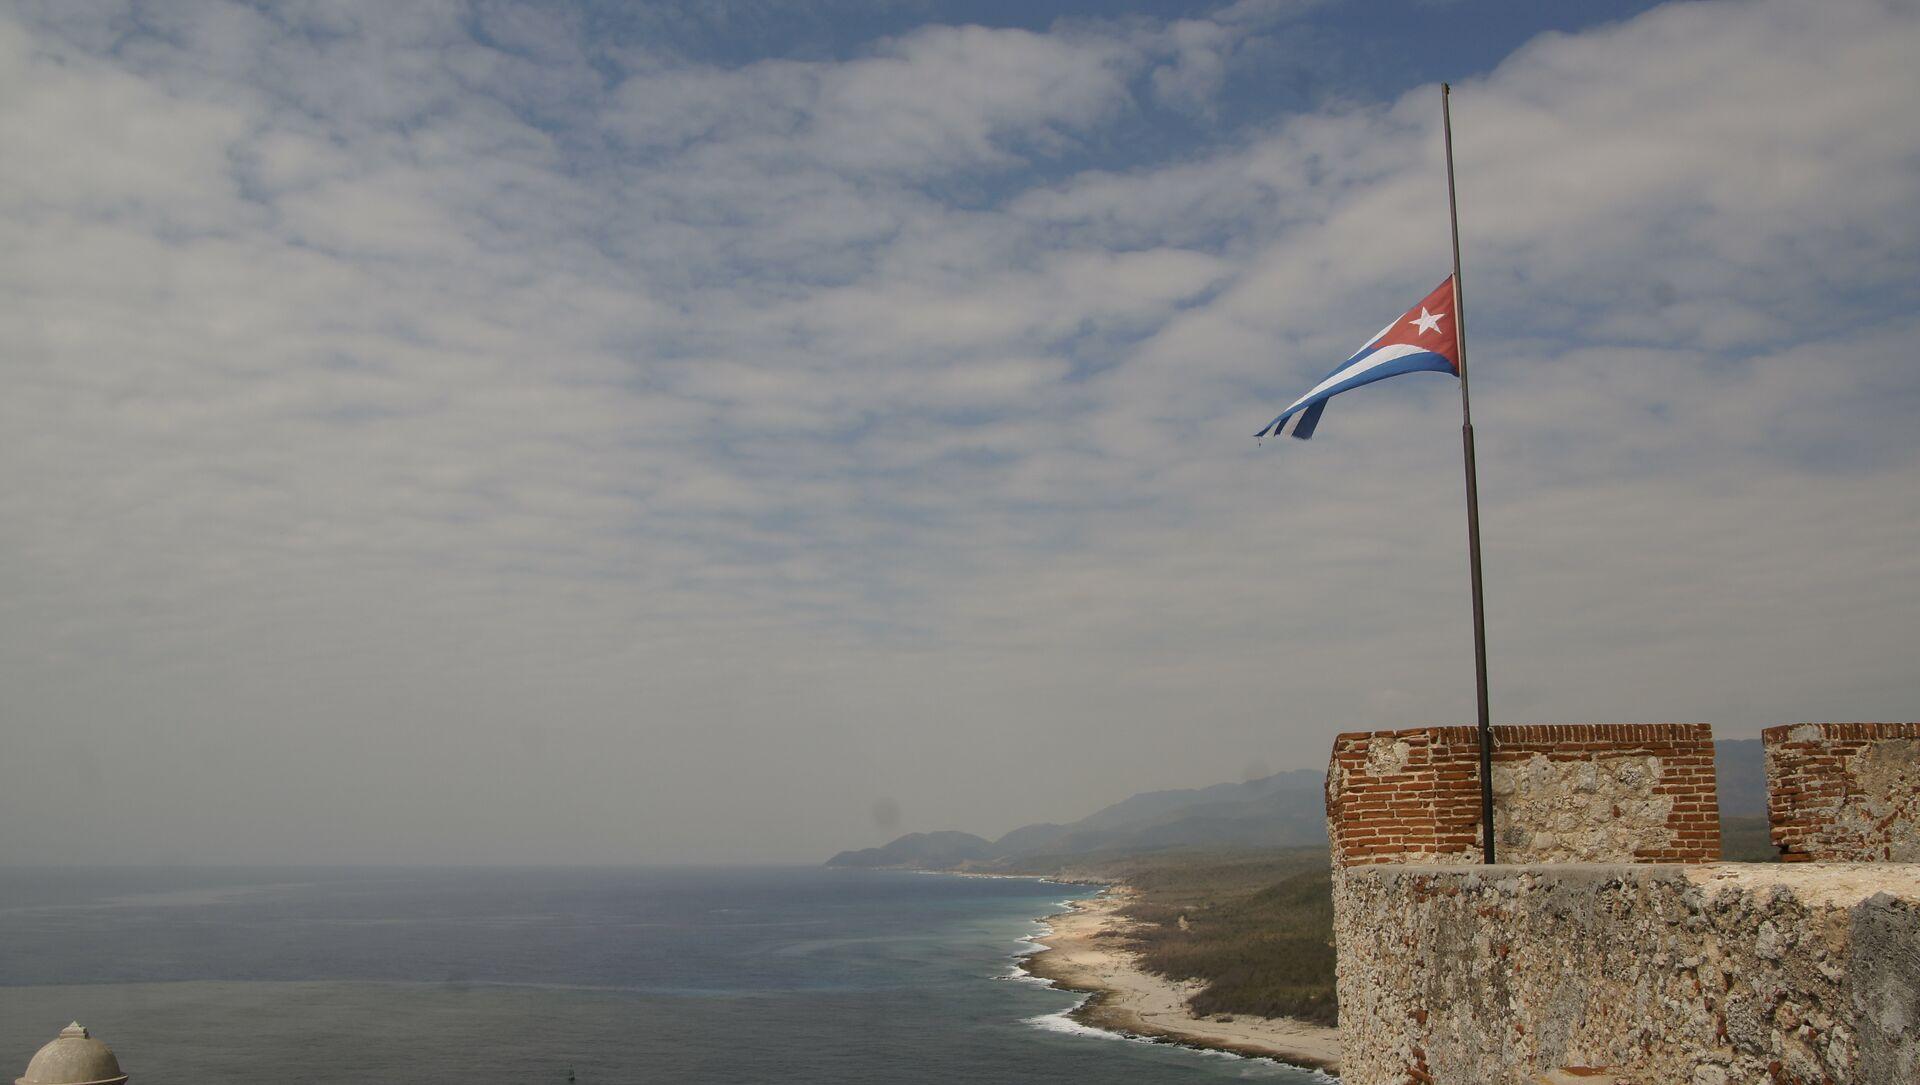 La bandera de Cuba - Sputnik Mundo, 1920, 09.05.2018